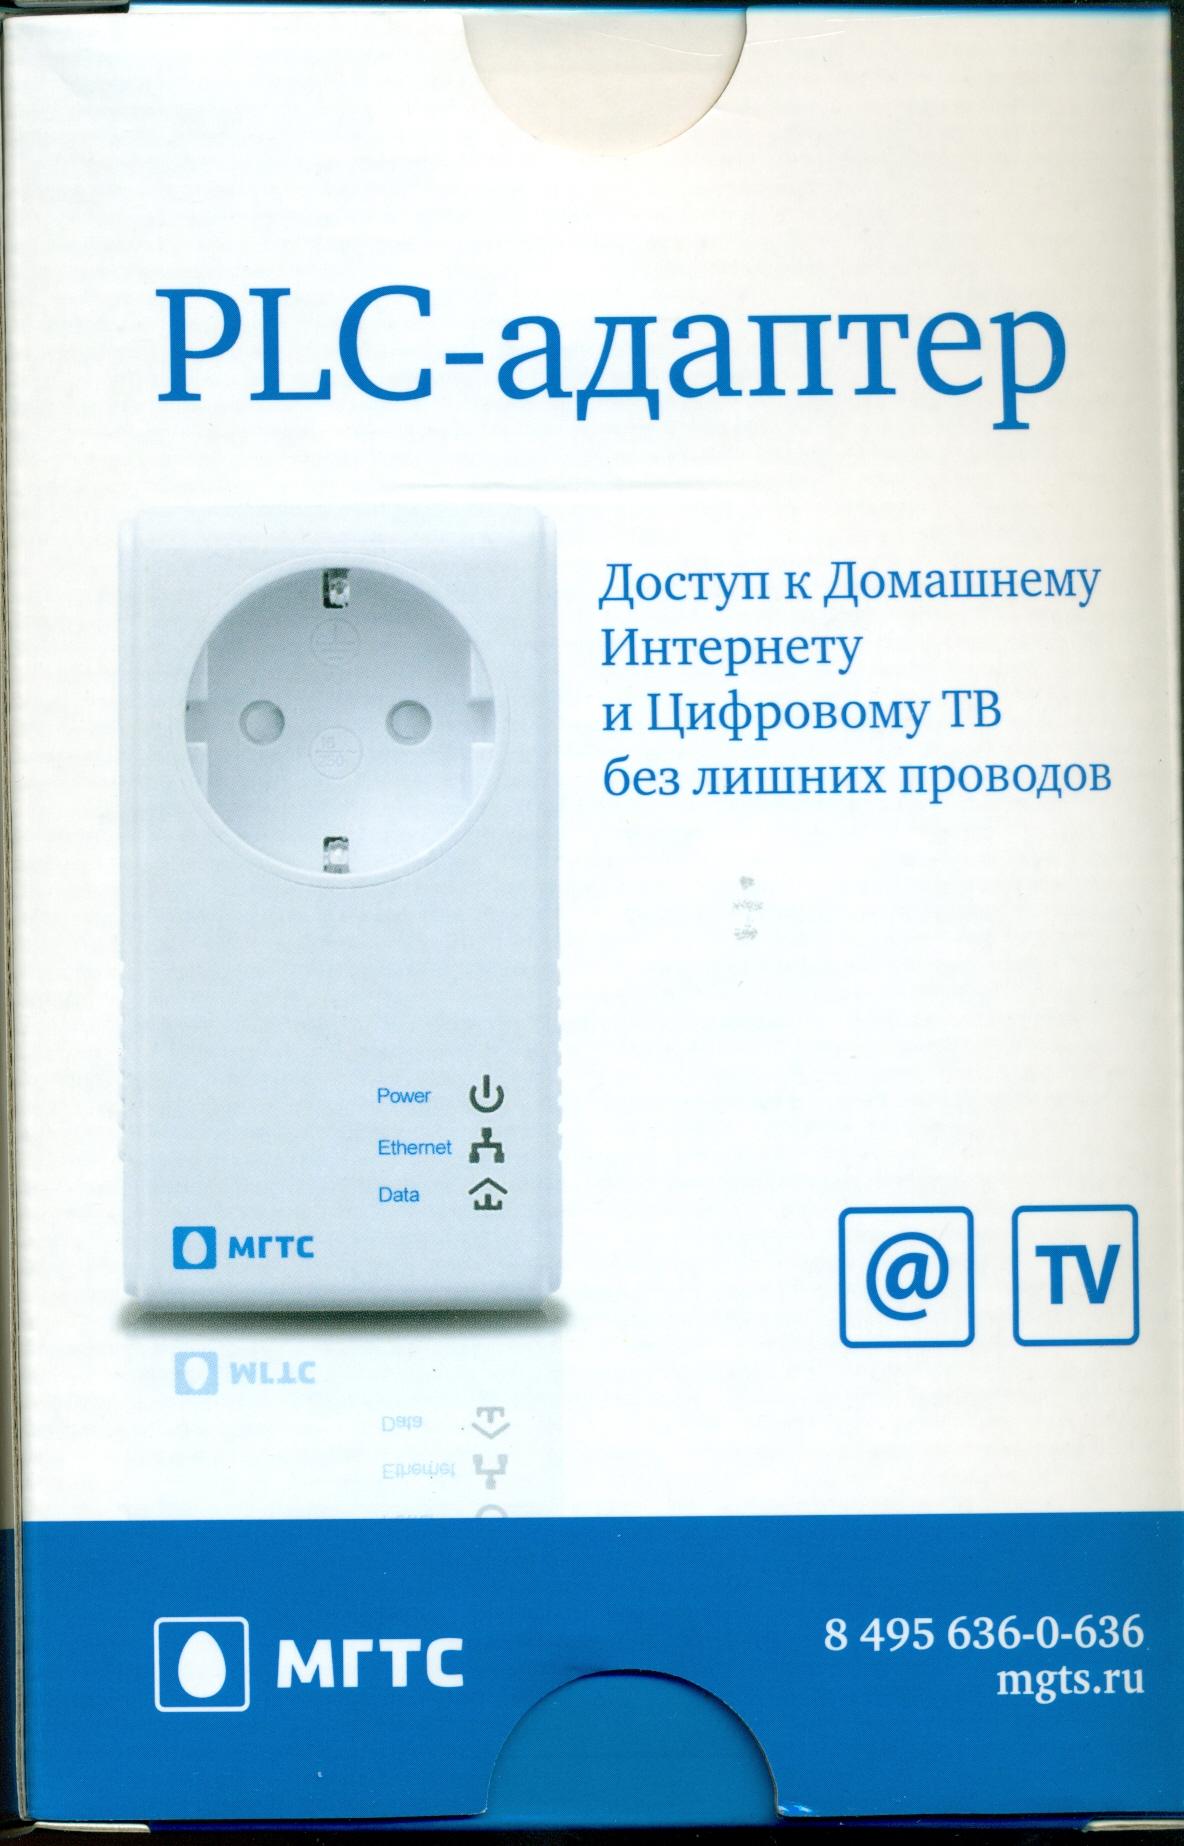 PLC-адаптер МГТС QTECH QPLA-200v.2P White  - купить со скидкой